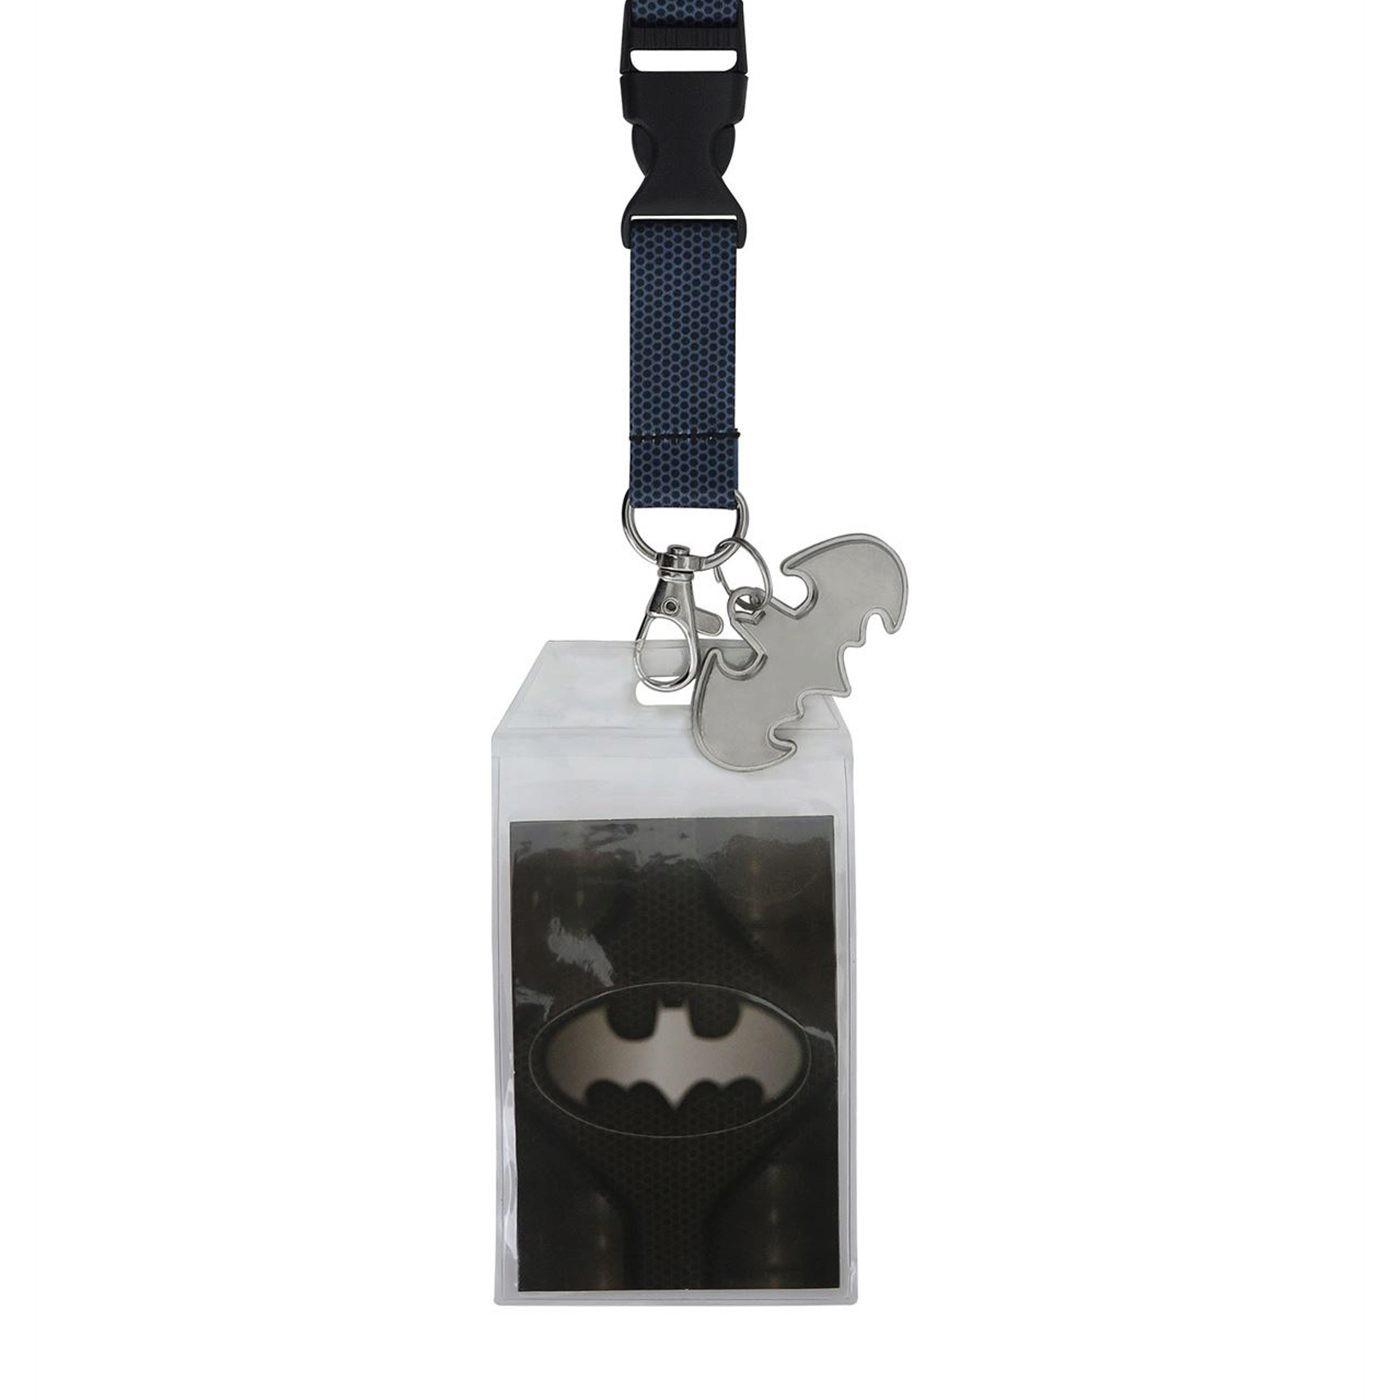 Batman Suit Up Lanyard with Metal Charm